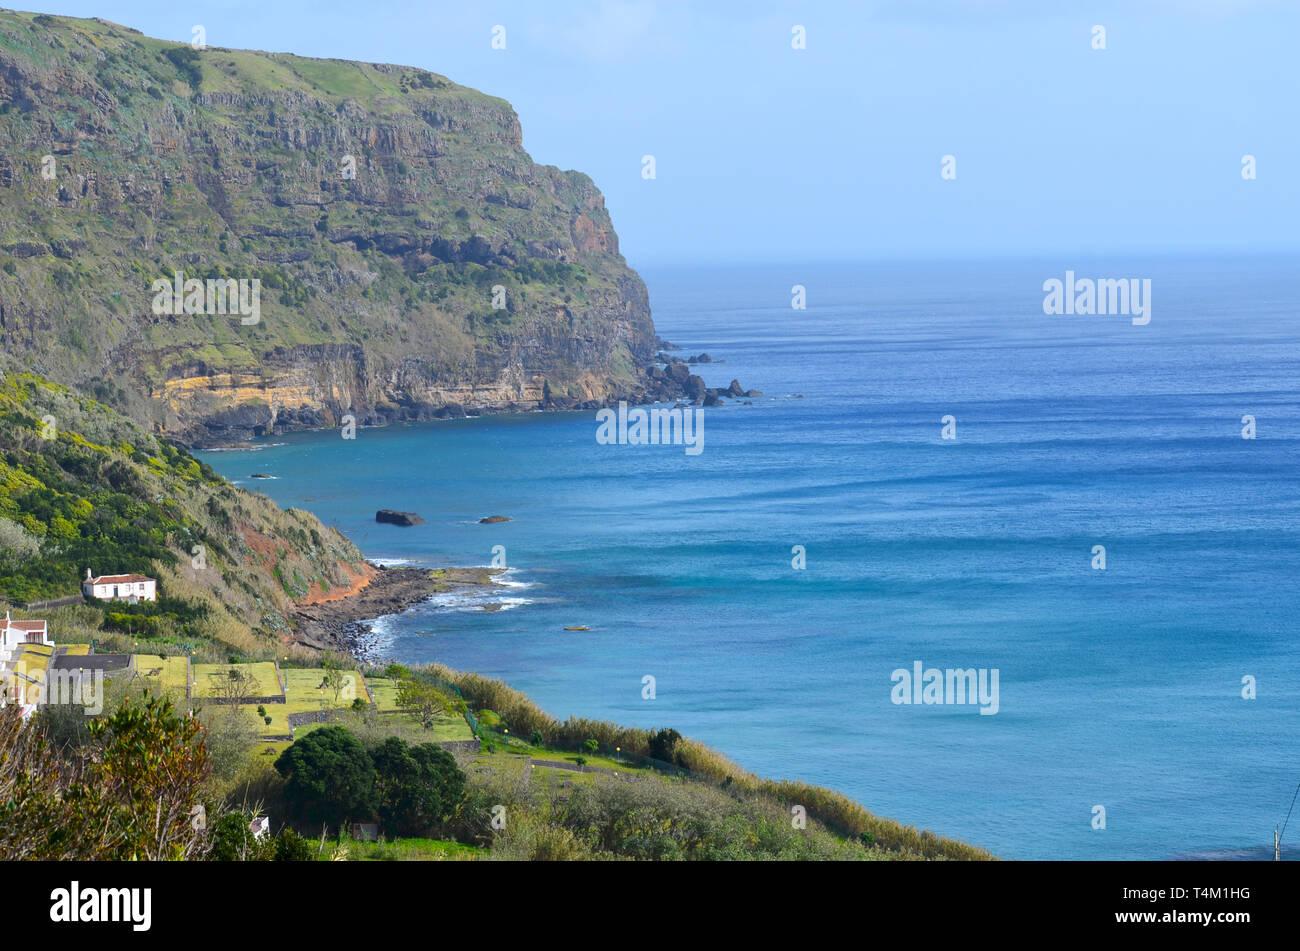 Praia Formosa Bay in Santa Maria island, Azores - Stock Image